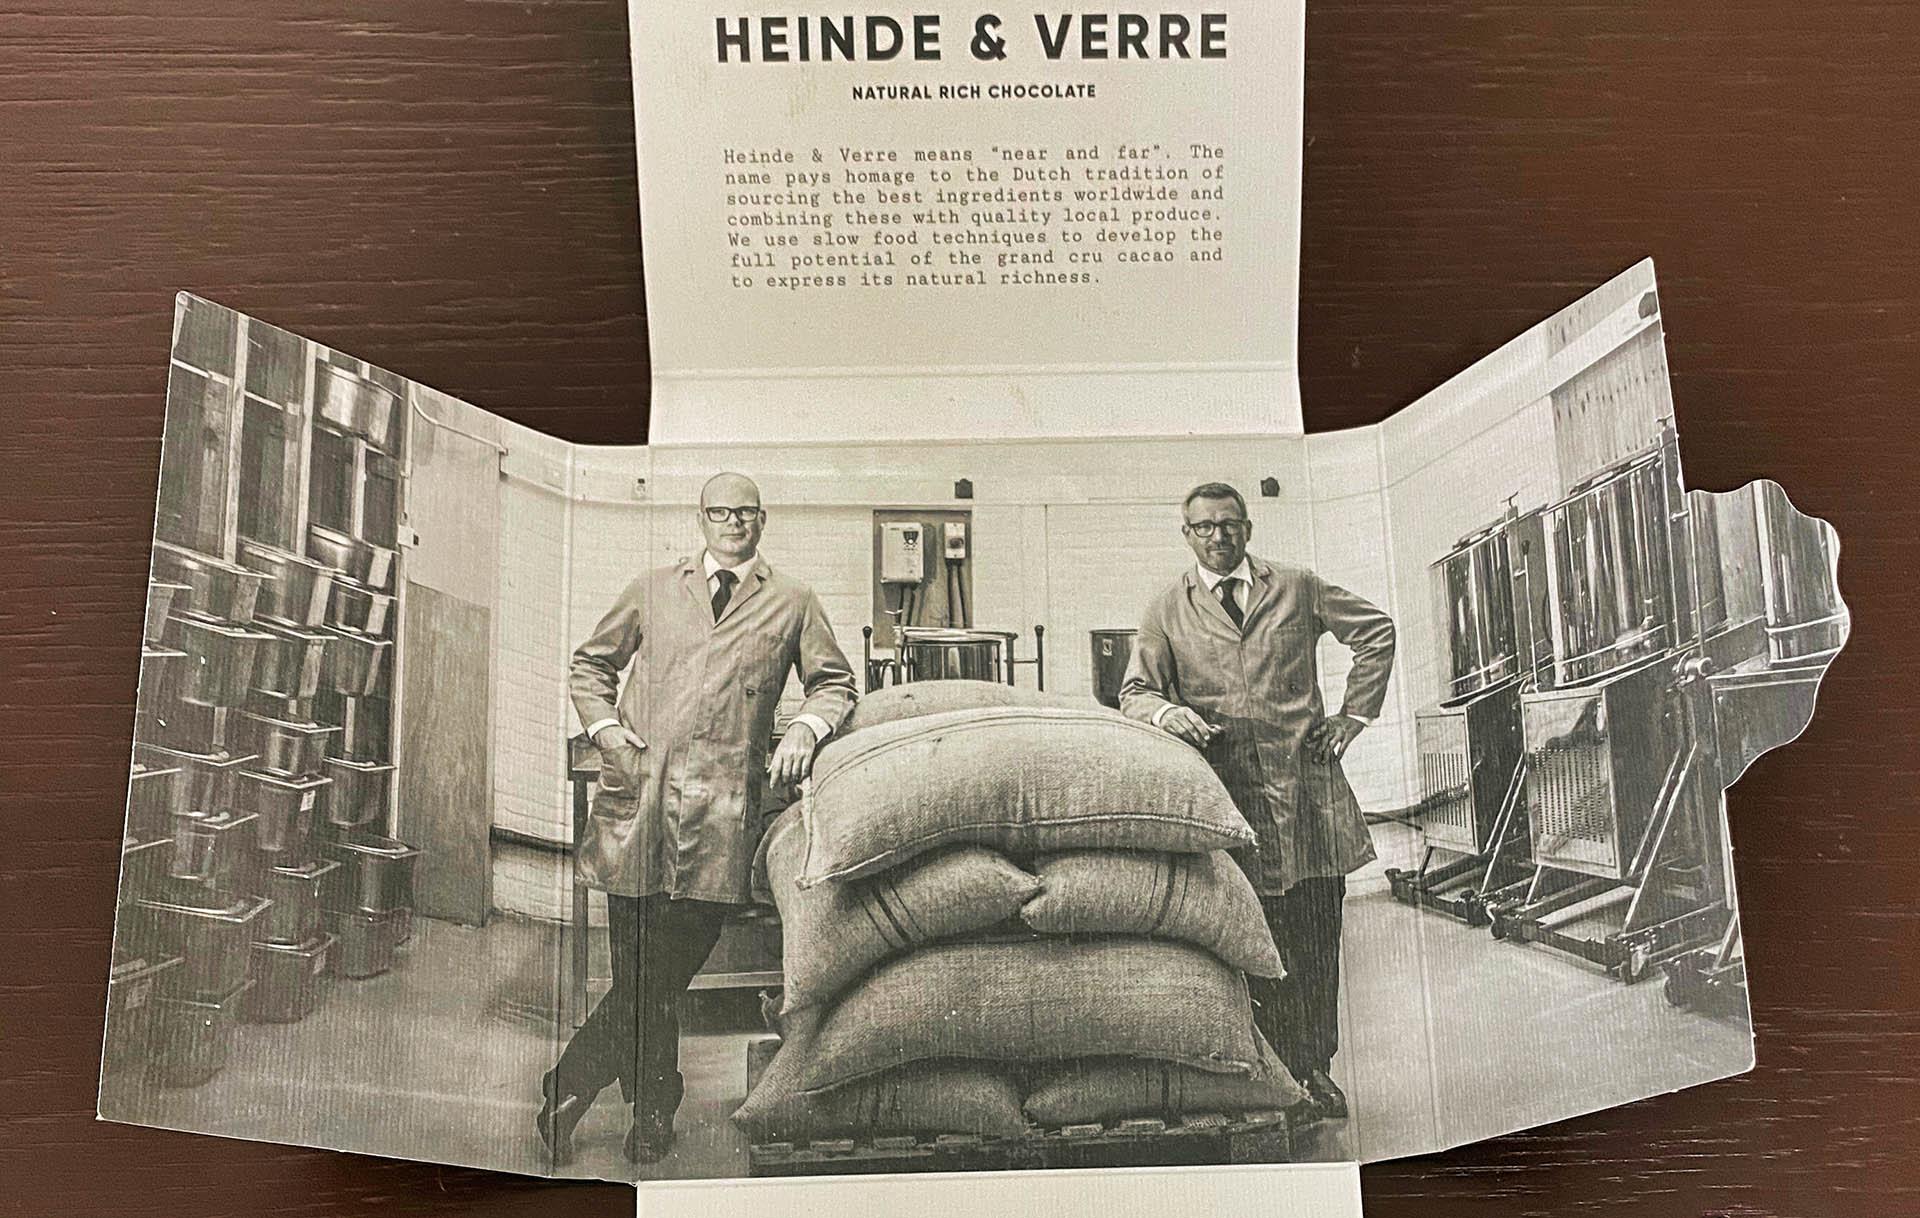 Heinde & Verre: Chocolate Near and Far